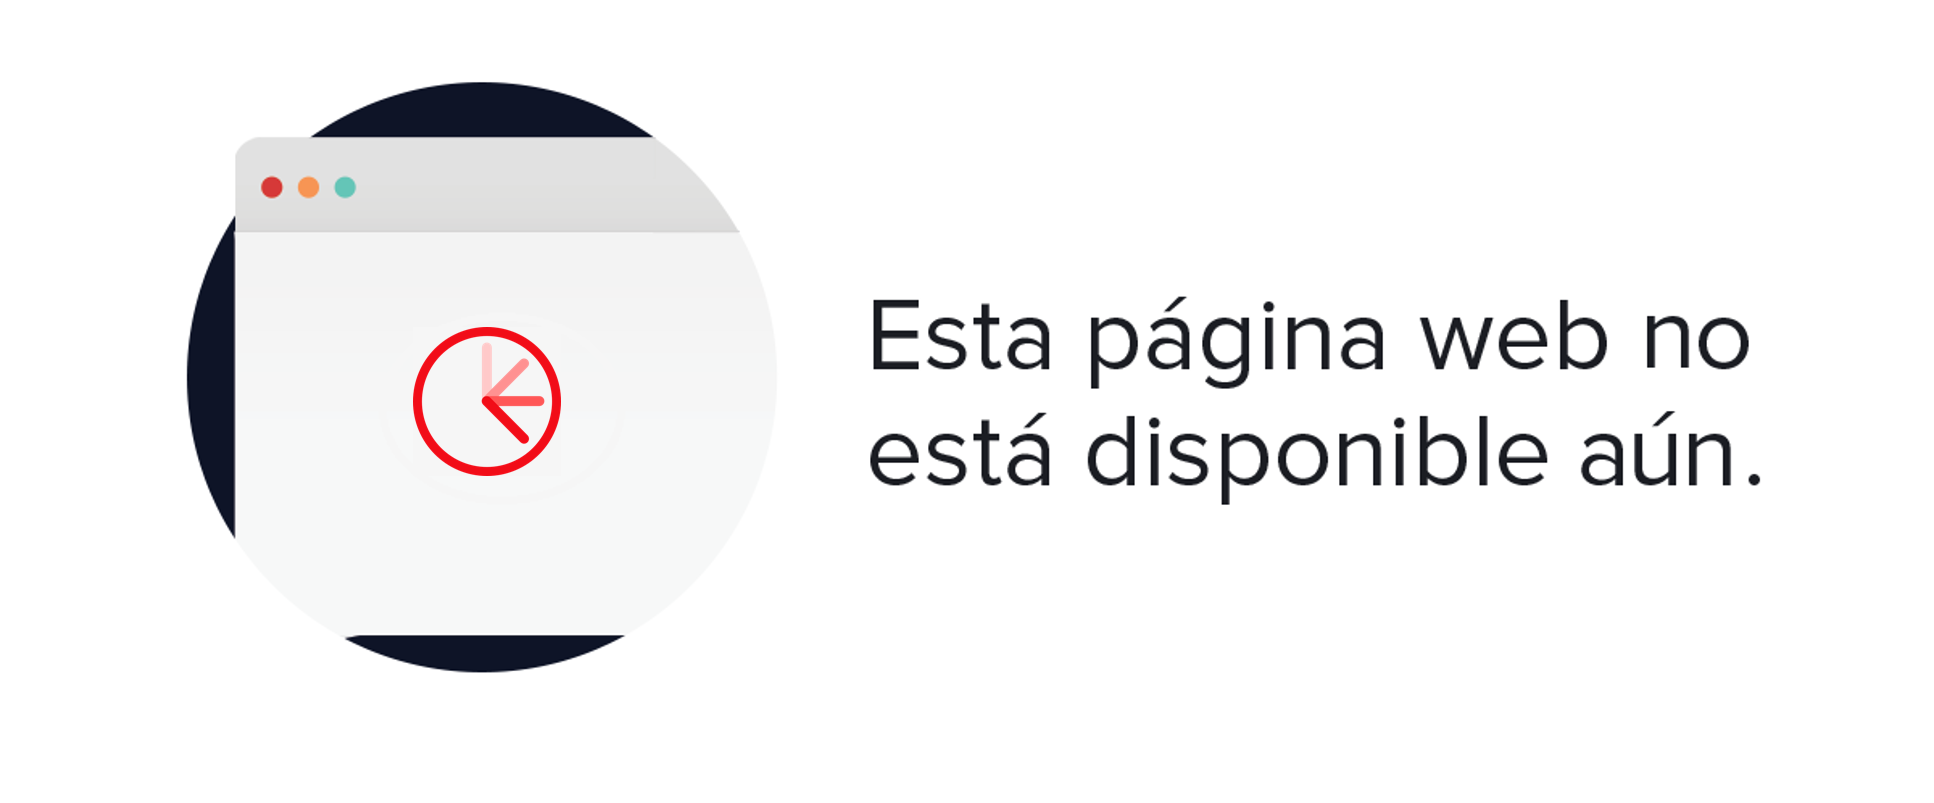 Naulover - Pantalón palazzo de mujer Naulover beige Beige 001013041304232040 - UCGXYYM